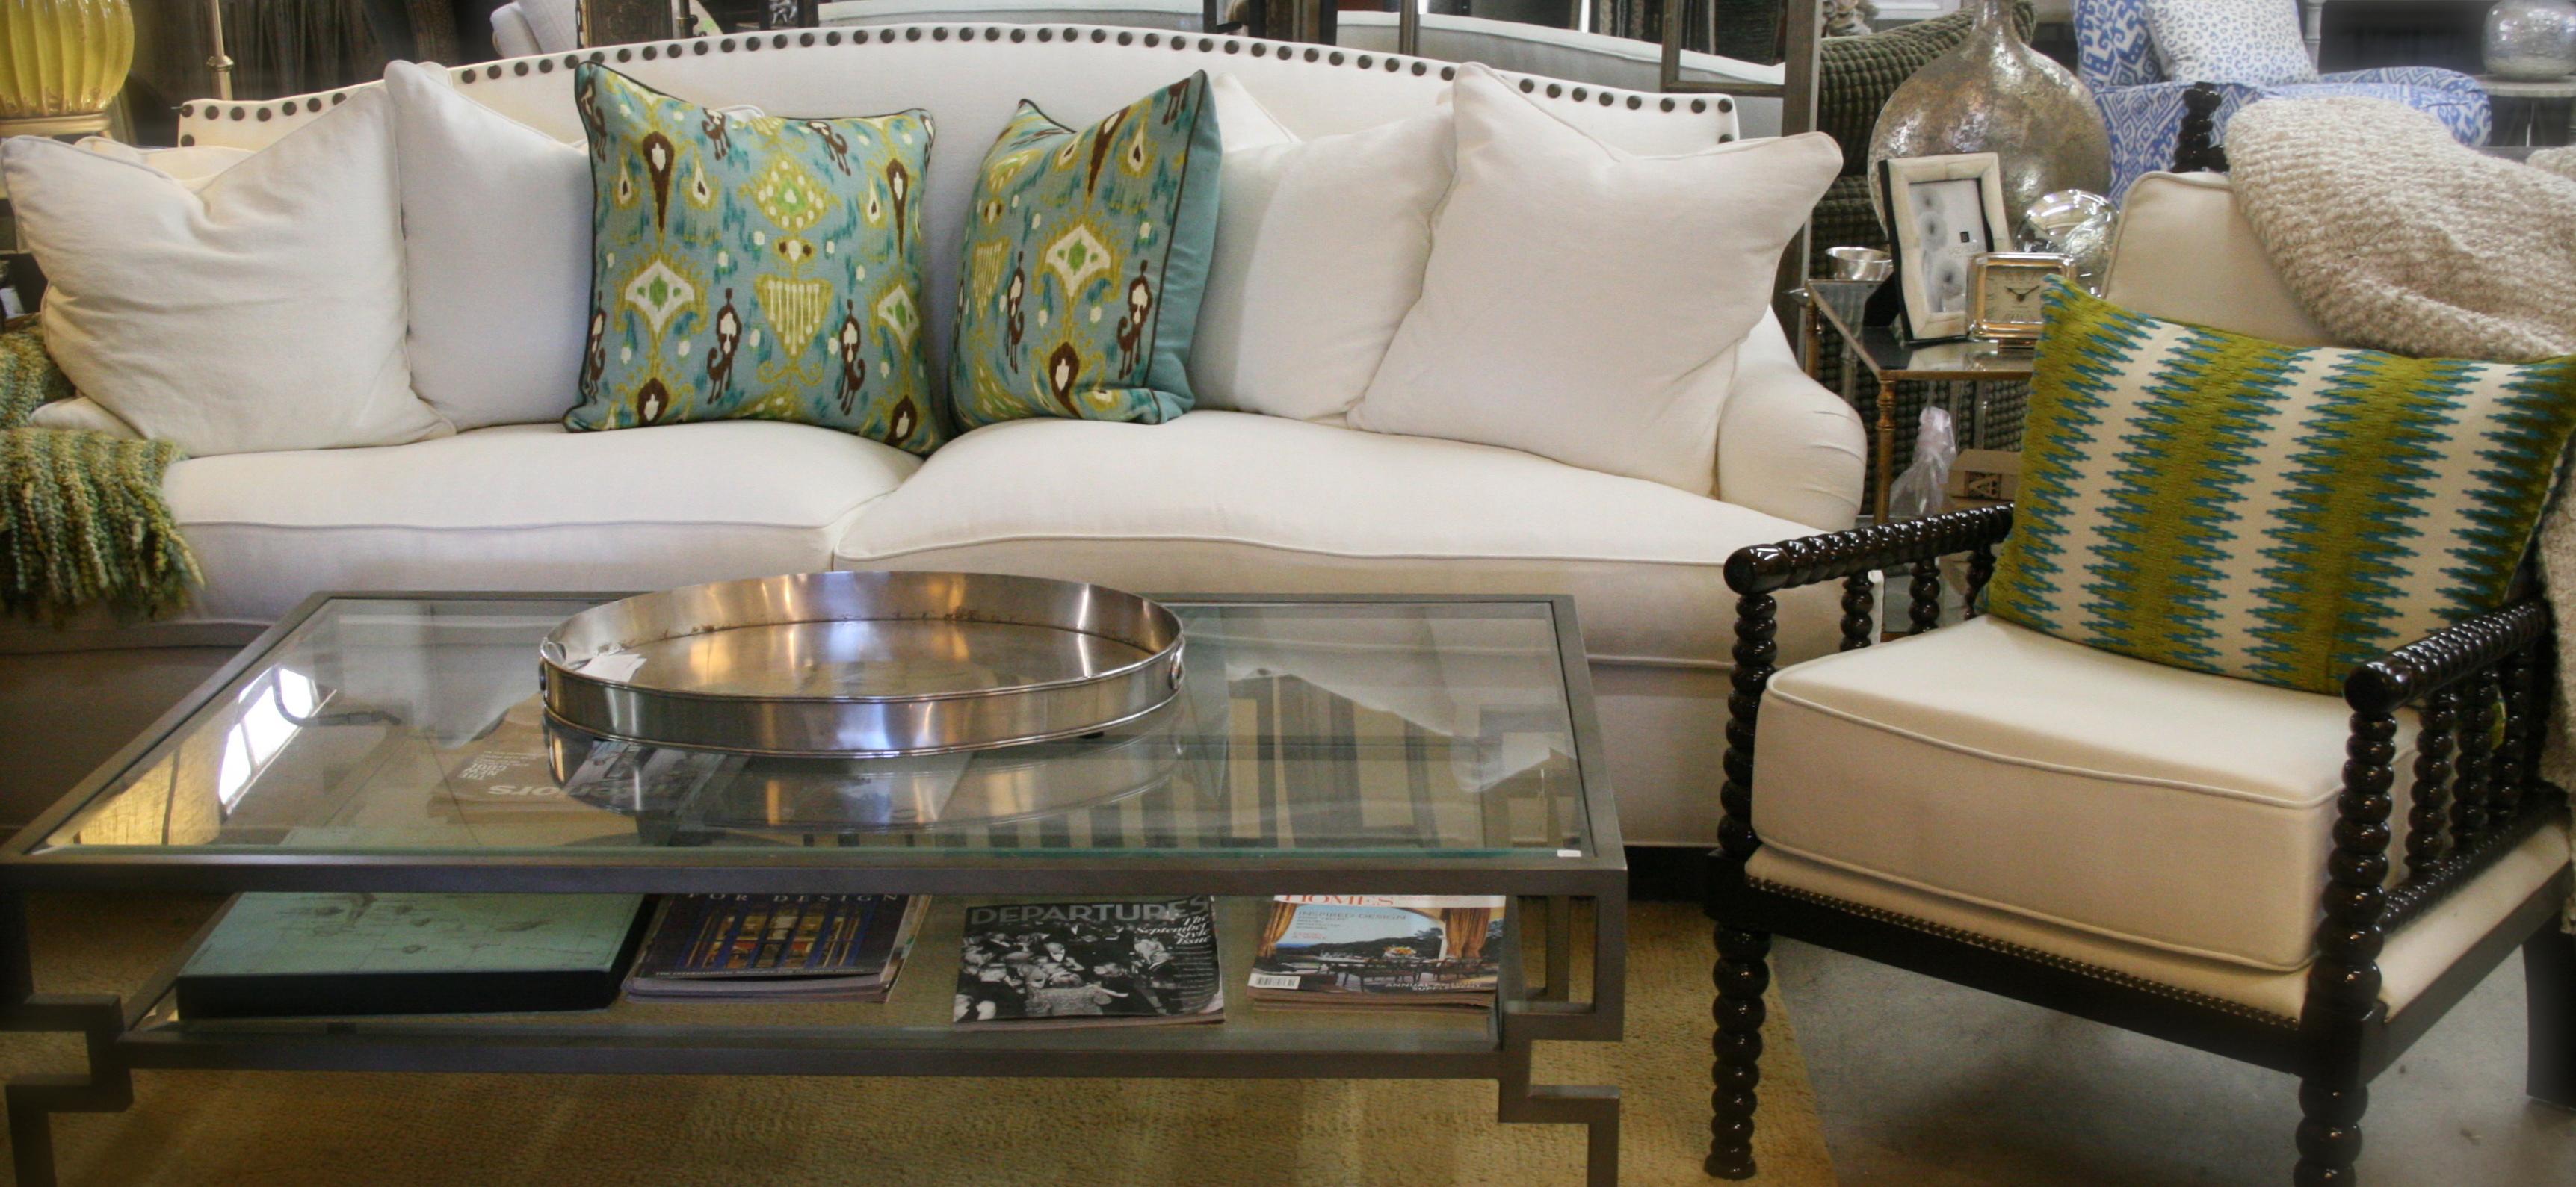 HtgT Furniture image 73